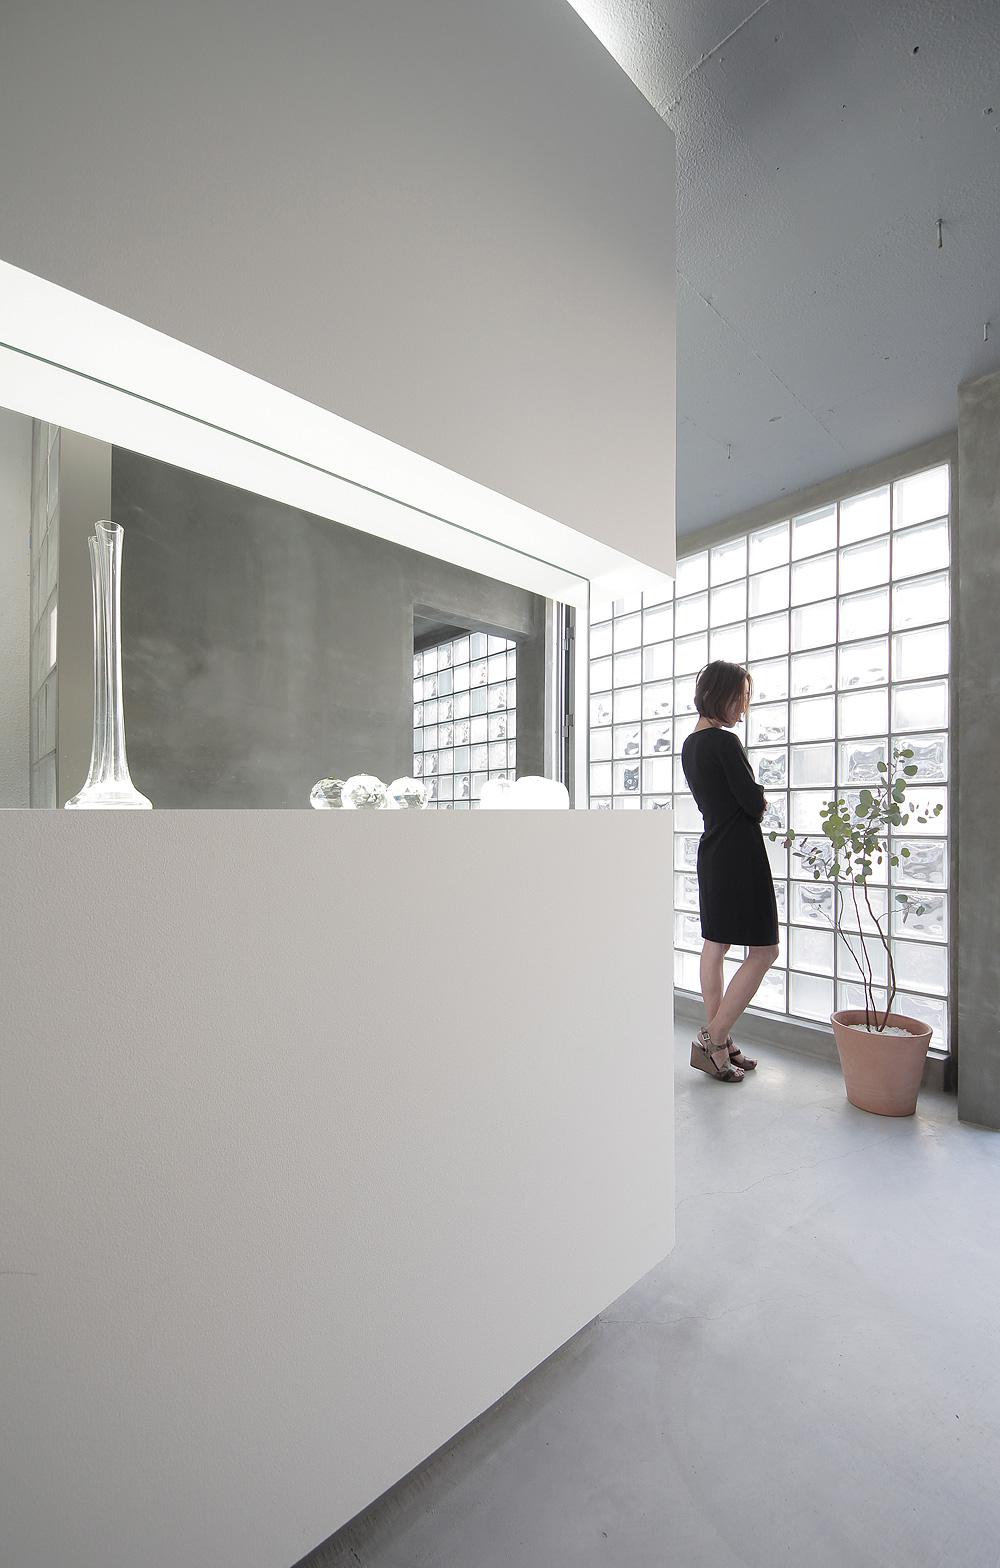 vivienda y galeria de arte jun murata (5)